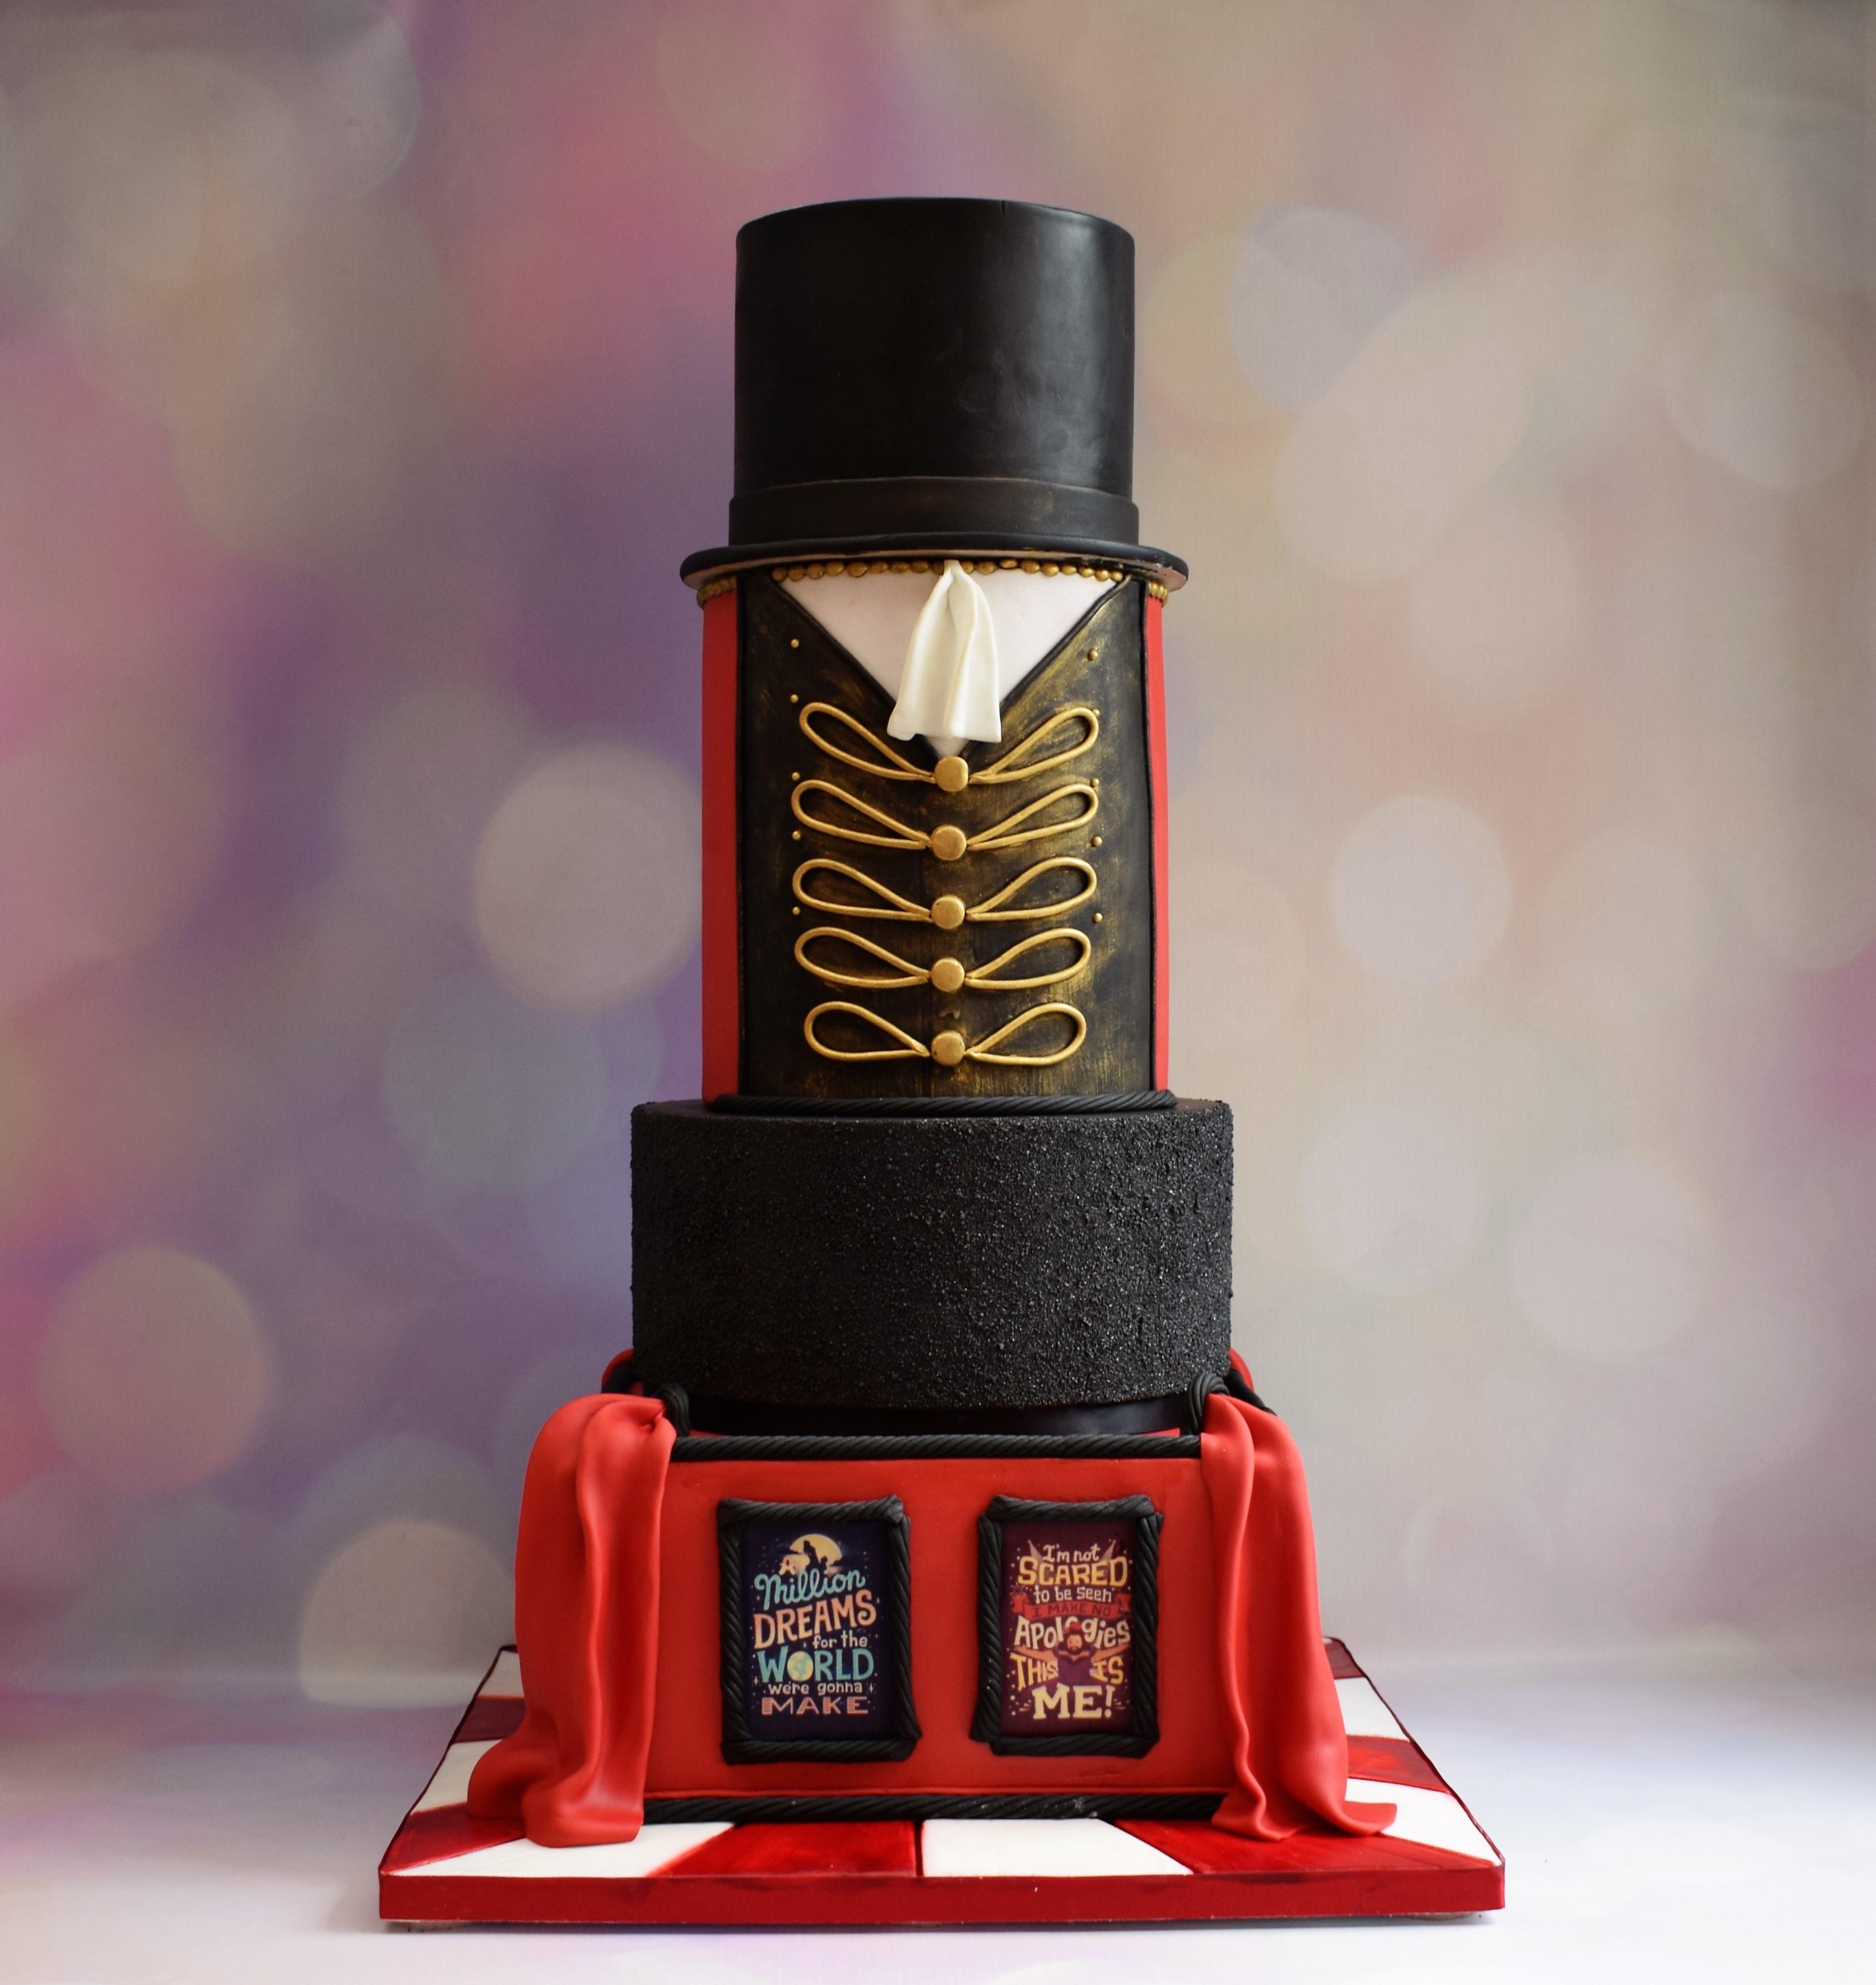 bake to the future - greatest showman wedding cake - circus wedding cake - creative wedding cake - different wedding cake